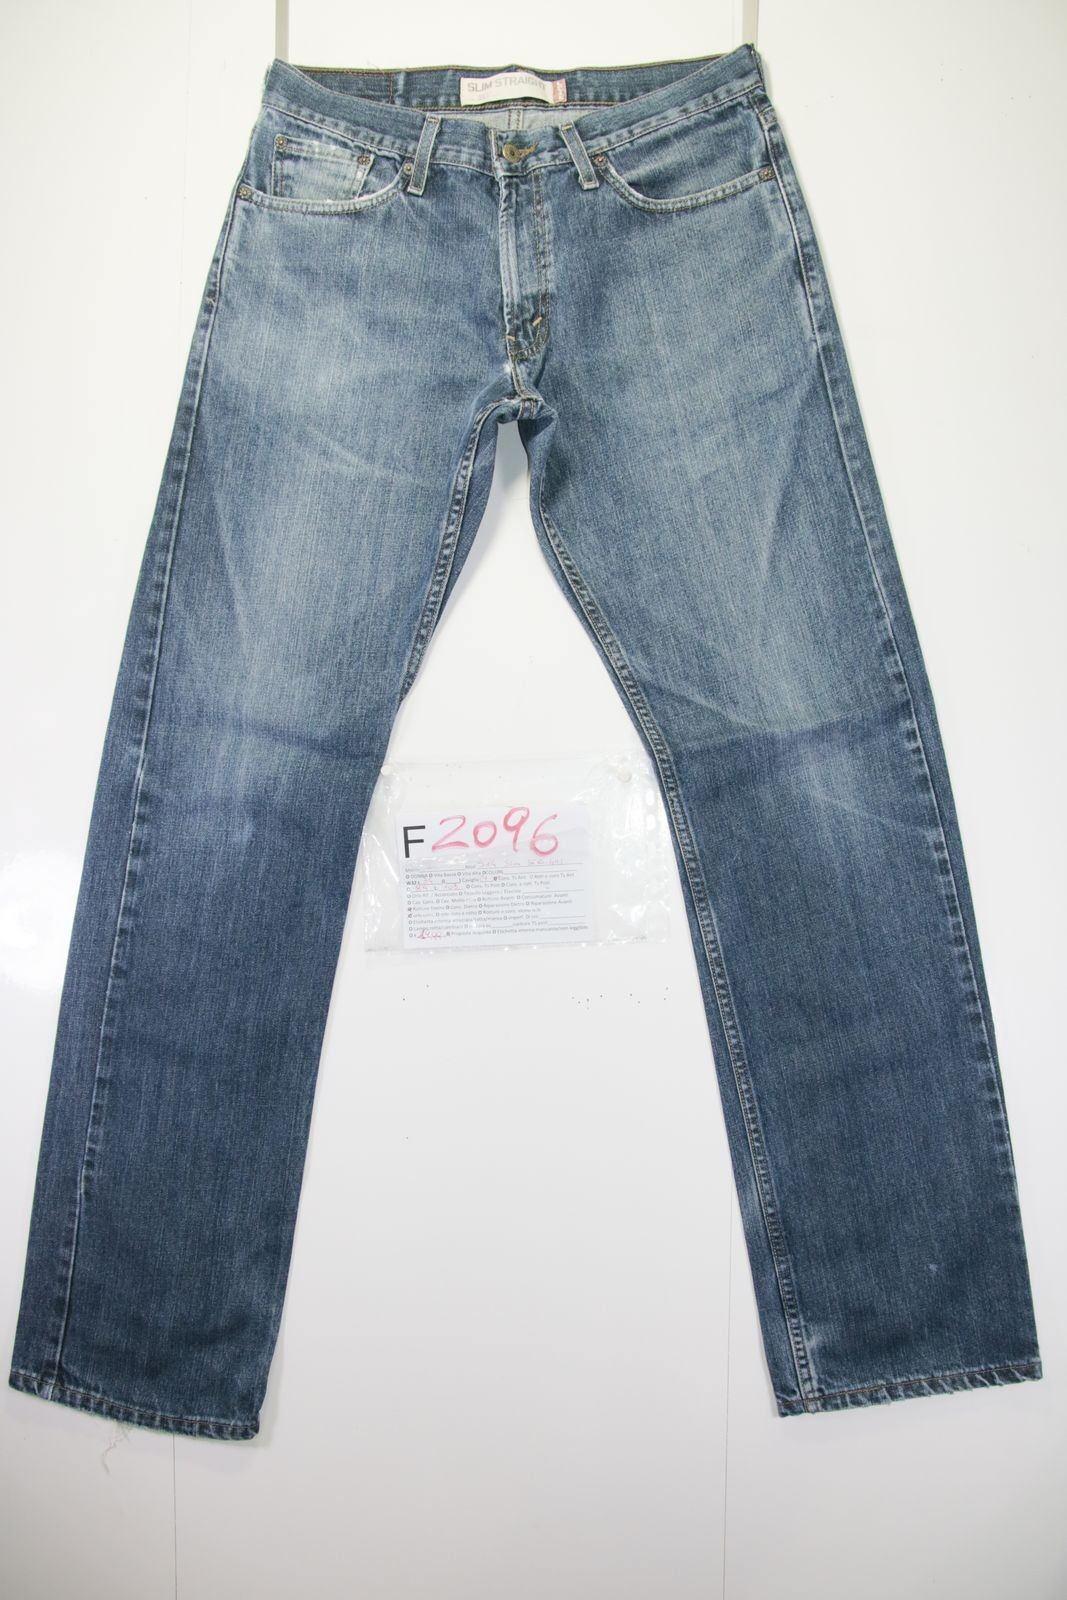 Levis 514 Slim Straight (Cod. F2096) Tg46 W32 L34 jeans Vintage usato Vita Alta Vintage jeans 12a679